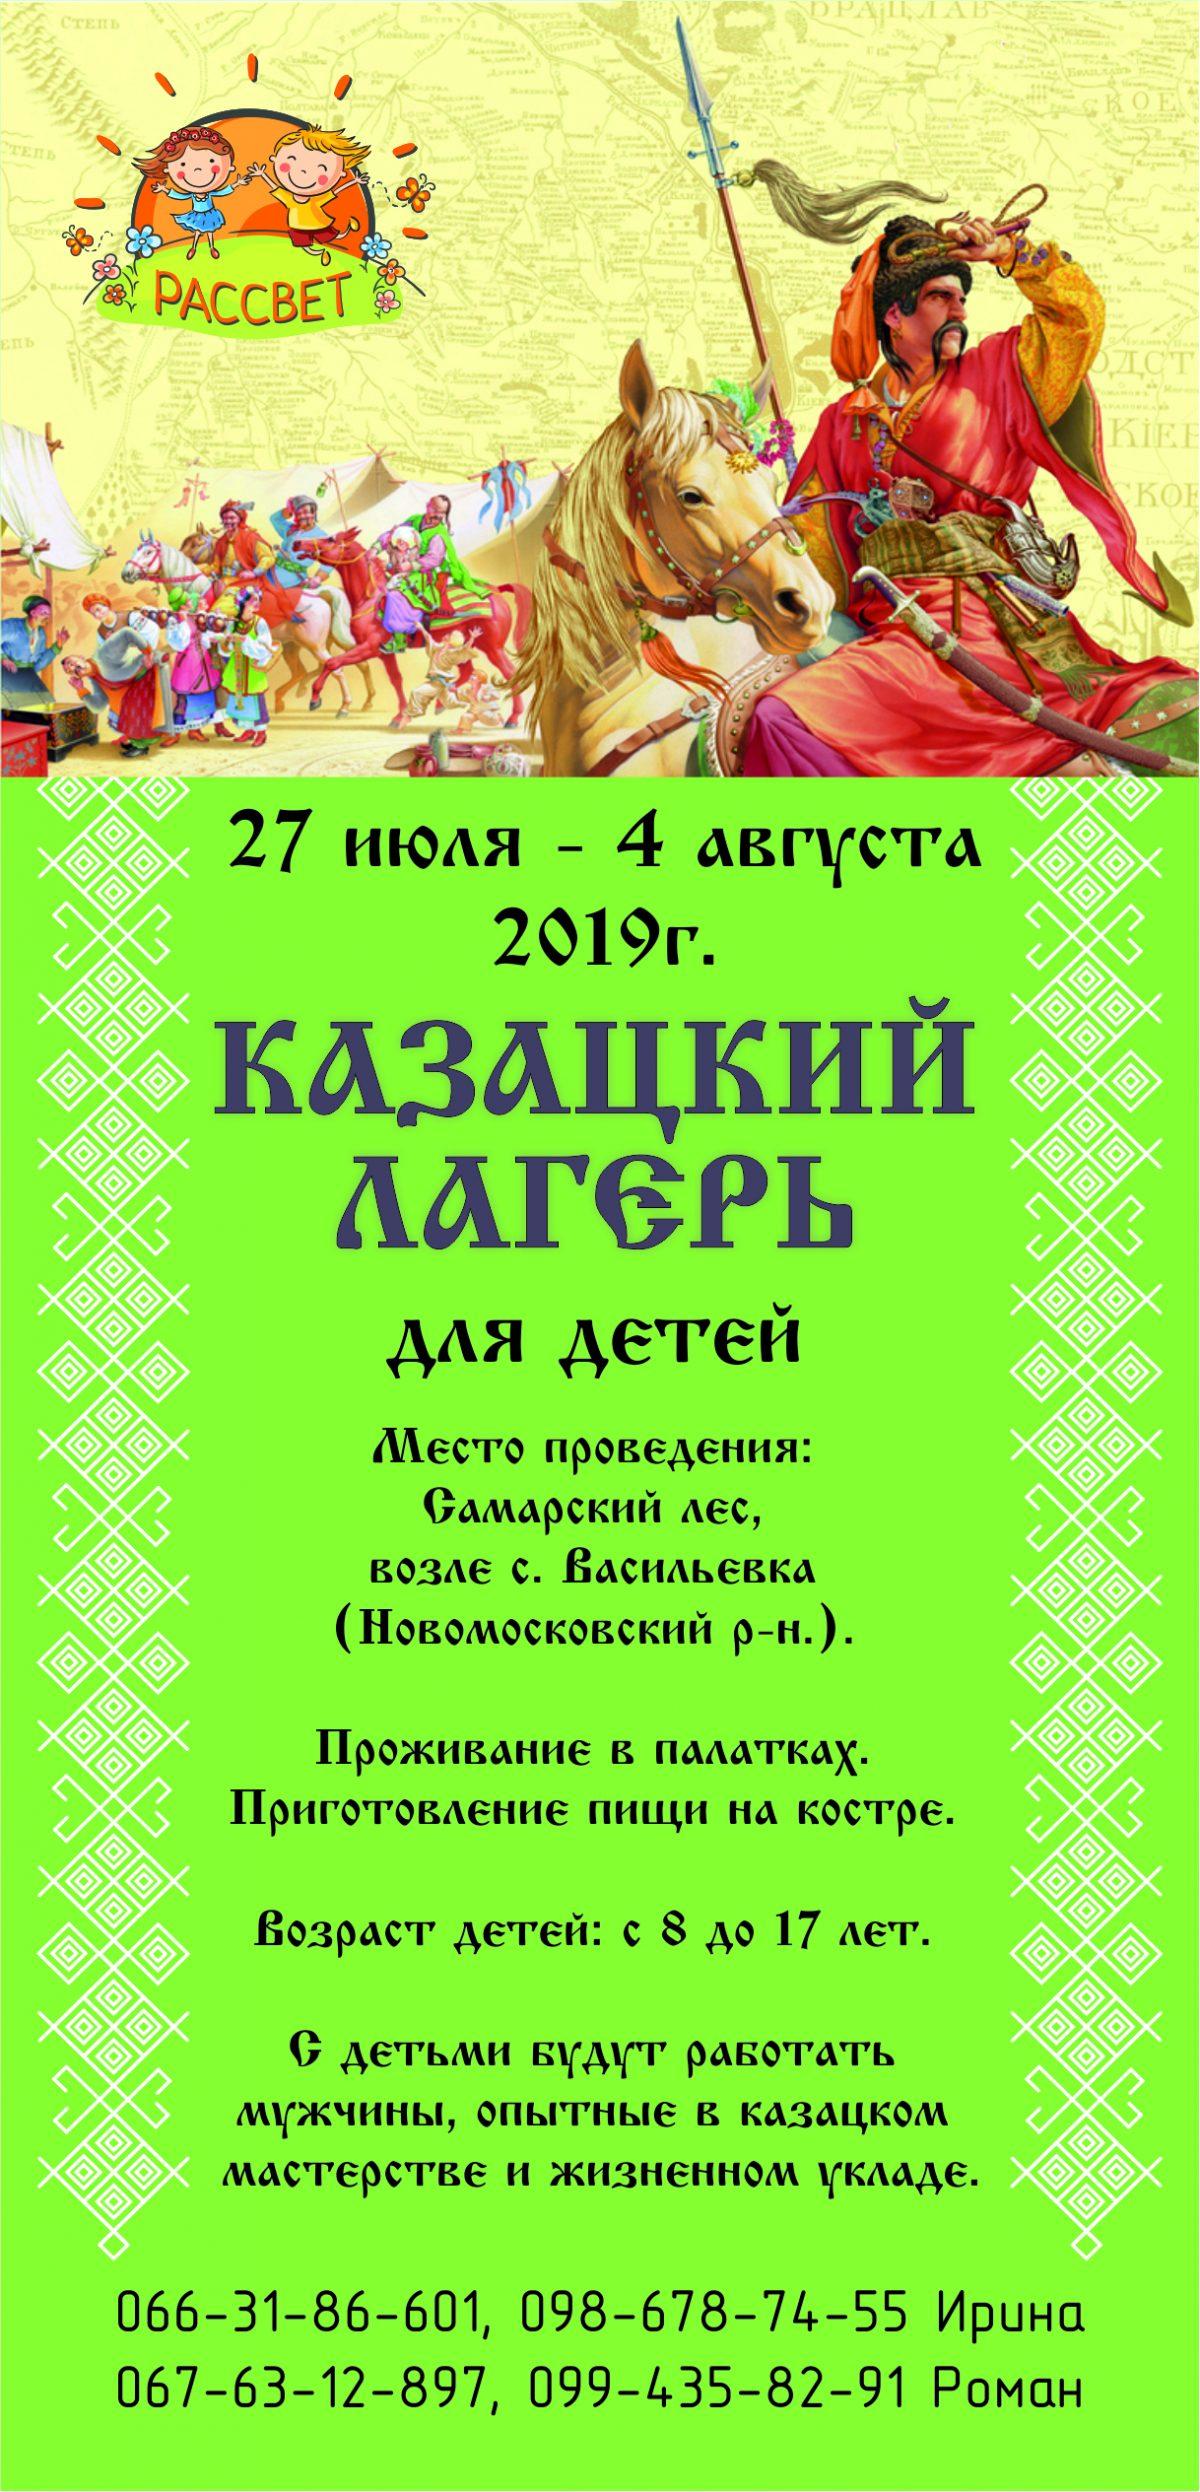 Казацкий Лагерь 2019г.